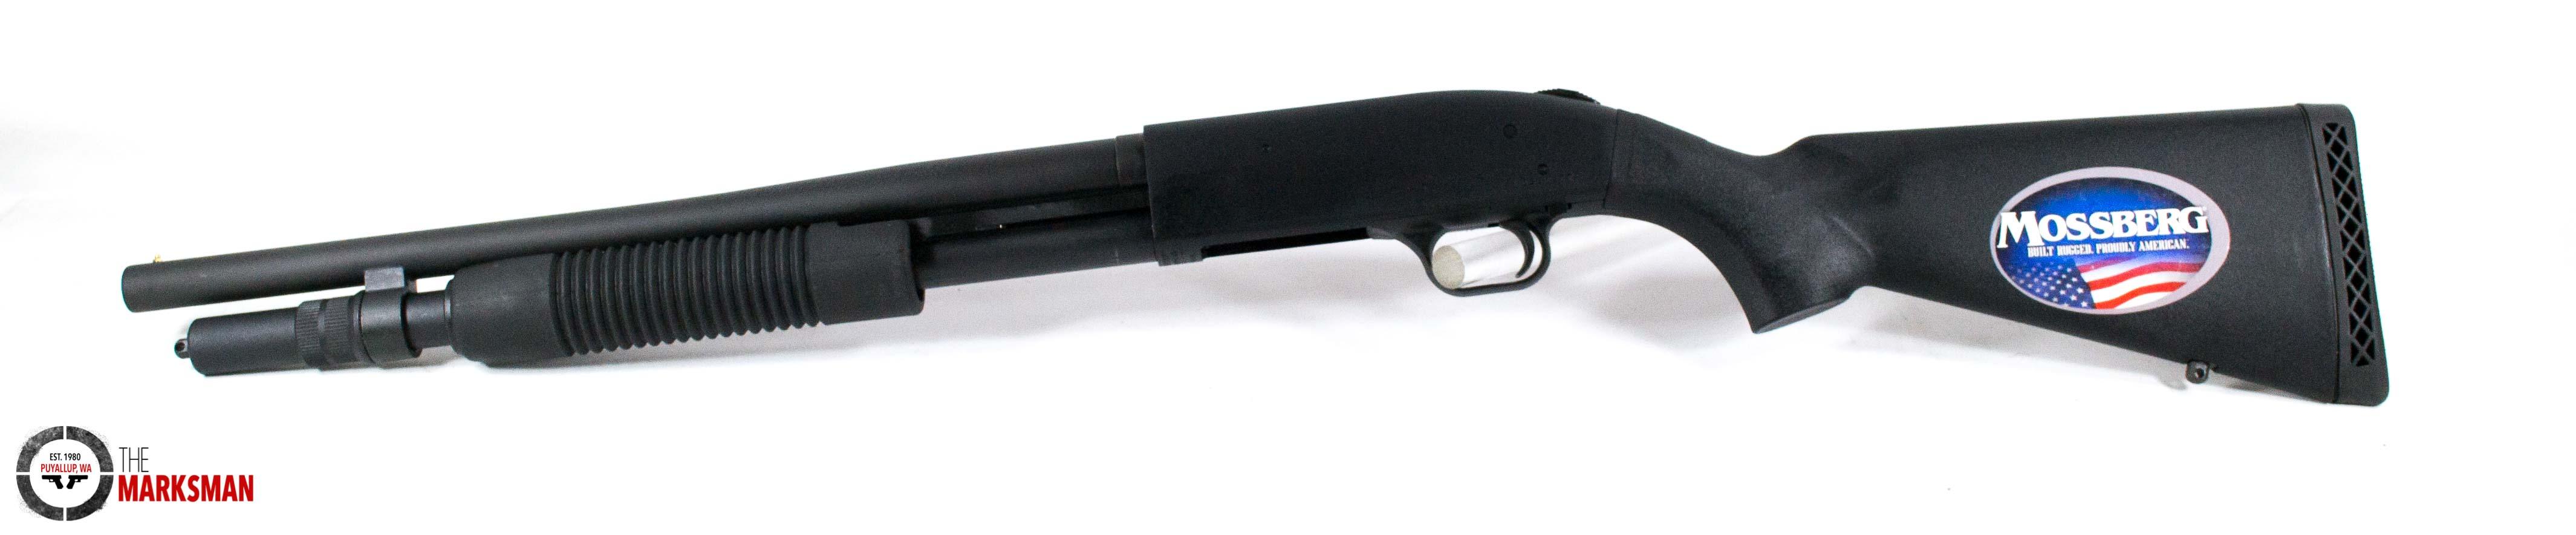 Mossberg 590 12 Gauge NEW 7 Shot 50778-img-0